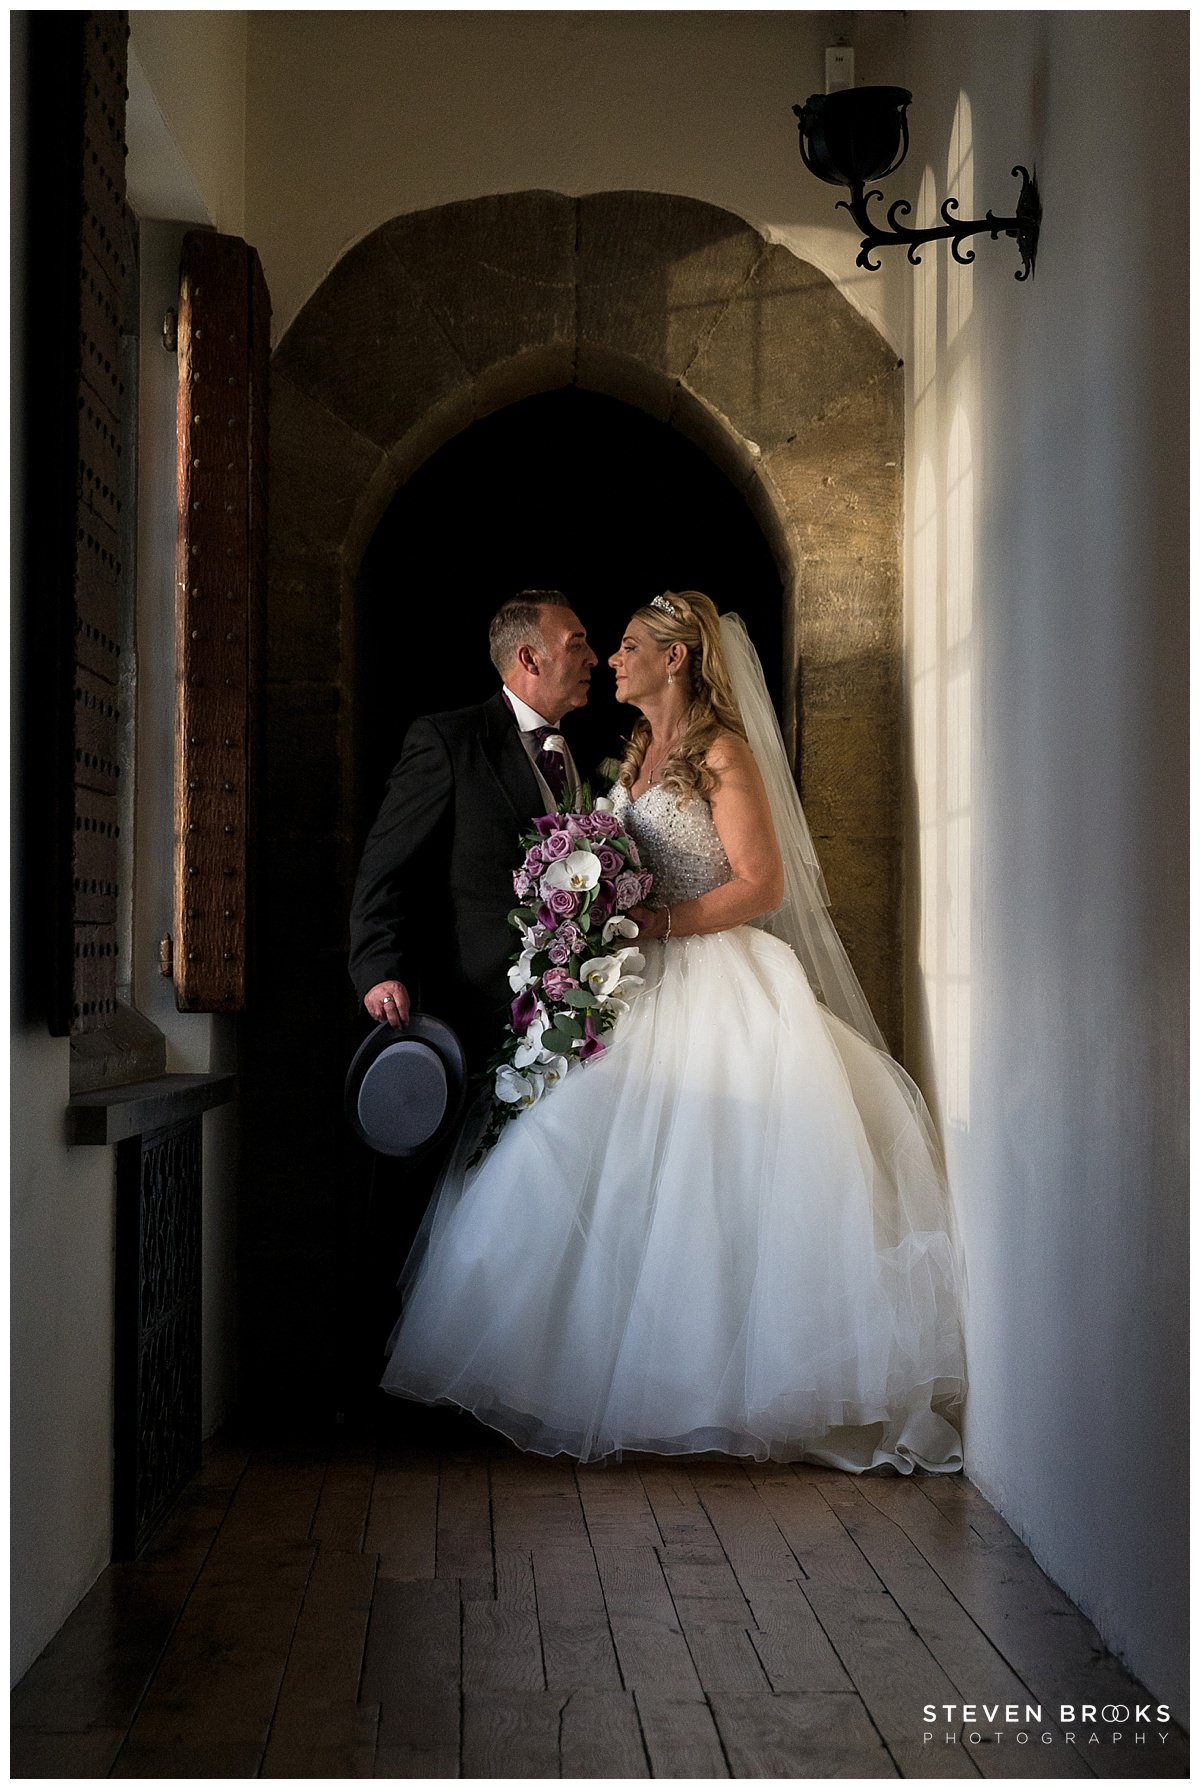 Leeds Castle wedding photographer steven brooks photographs the bride and groom the evening light at Leeds Castle